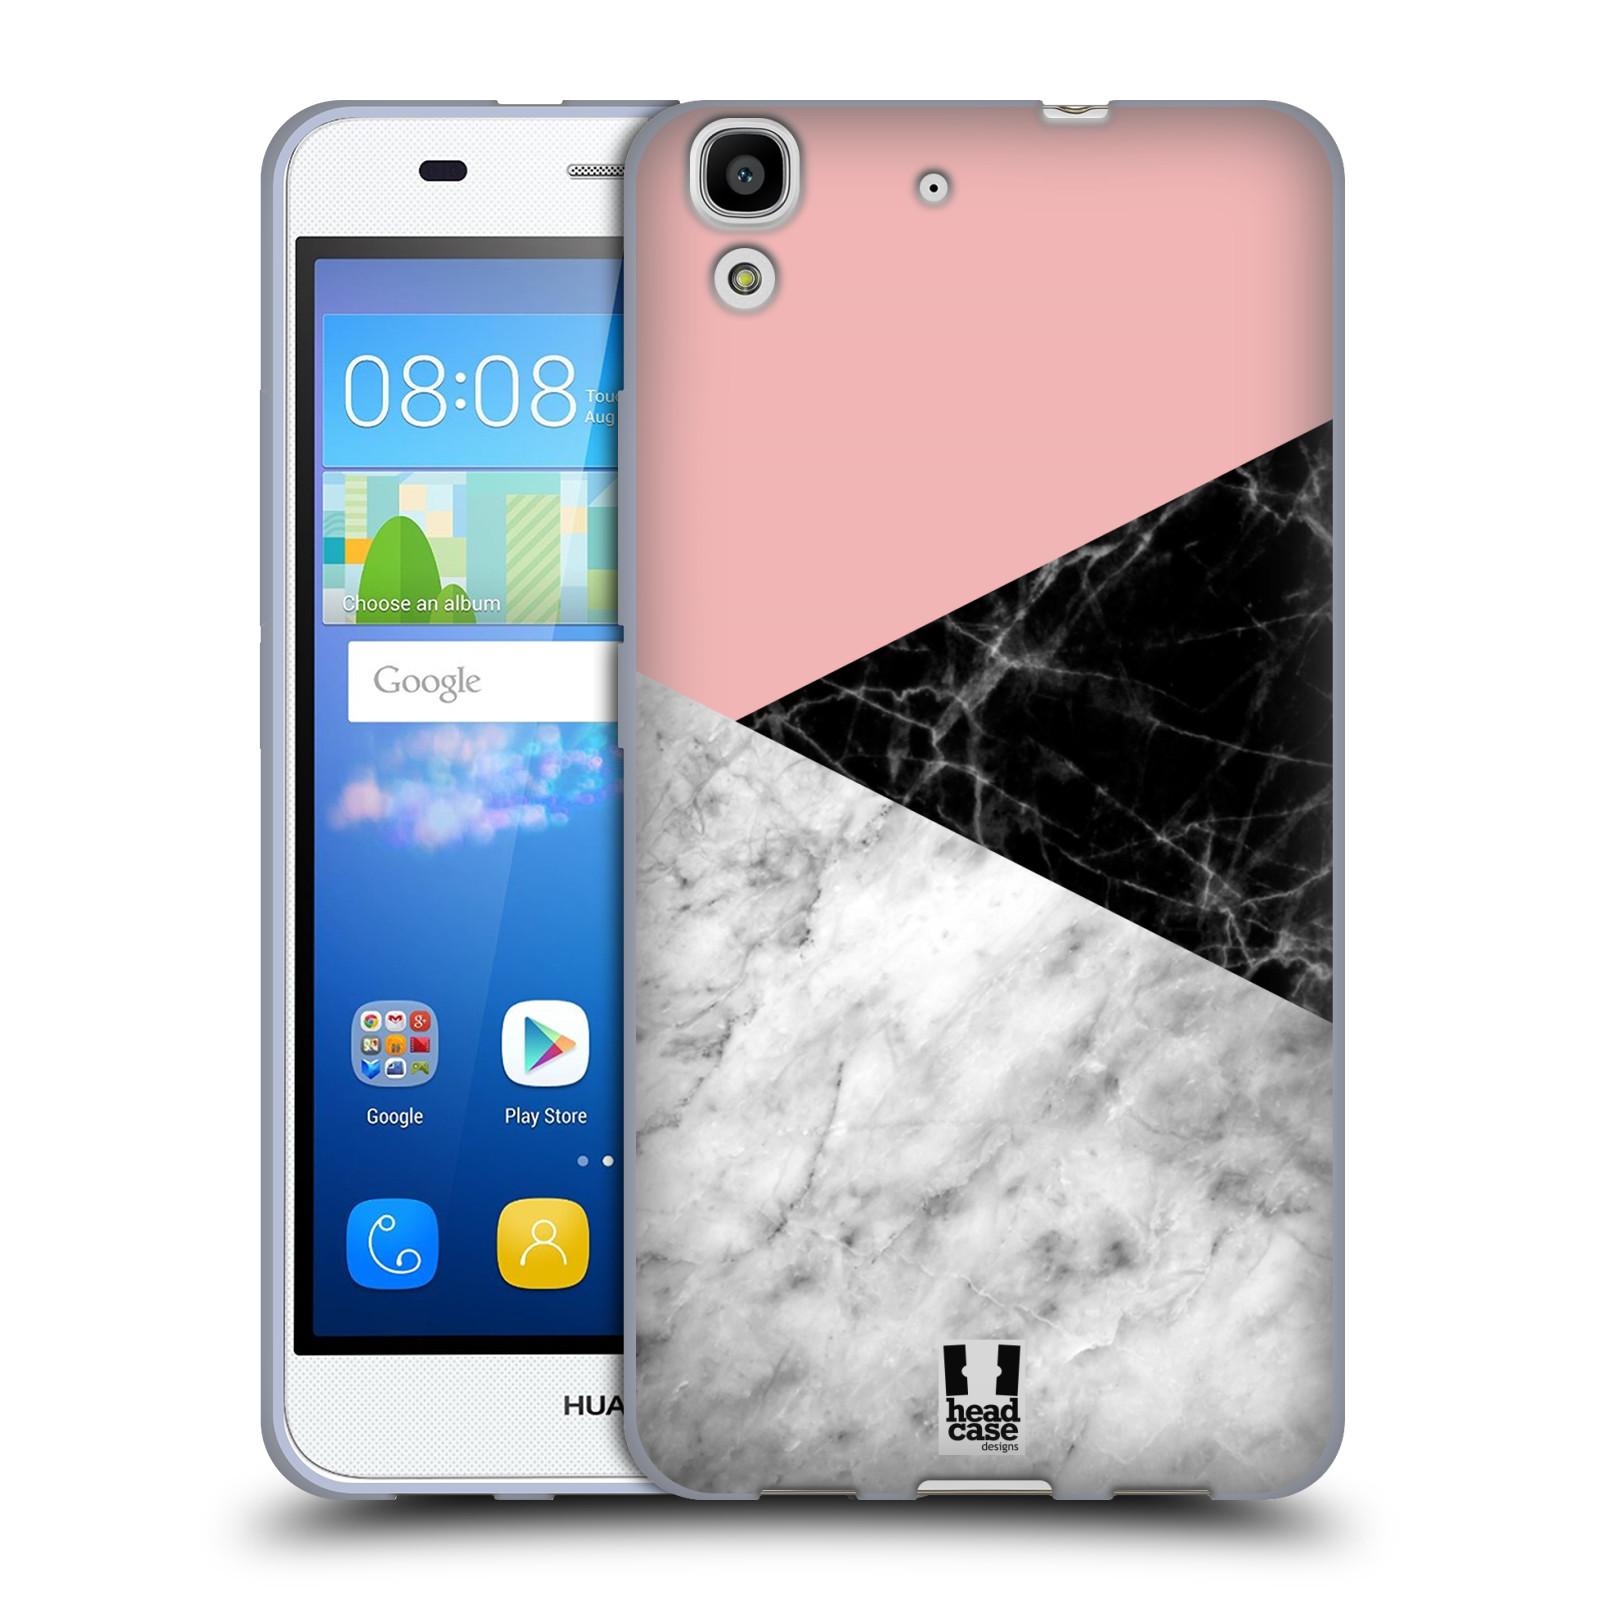 Silikonové pouzdro na mobil Huawei Y6 - Head Case - Mramor mix